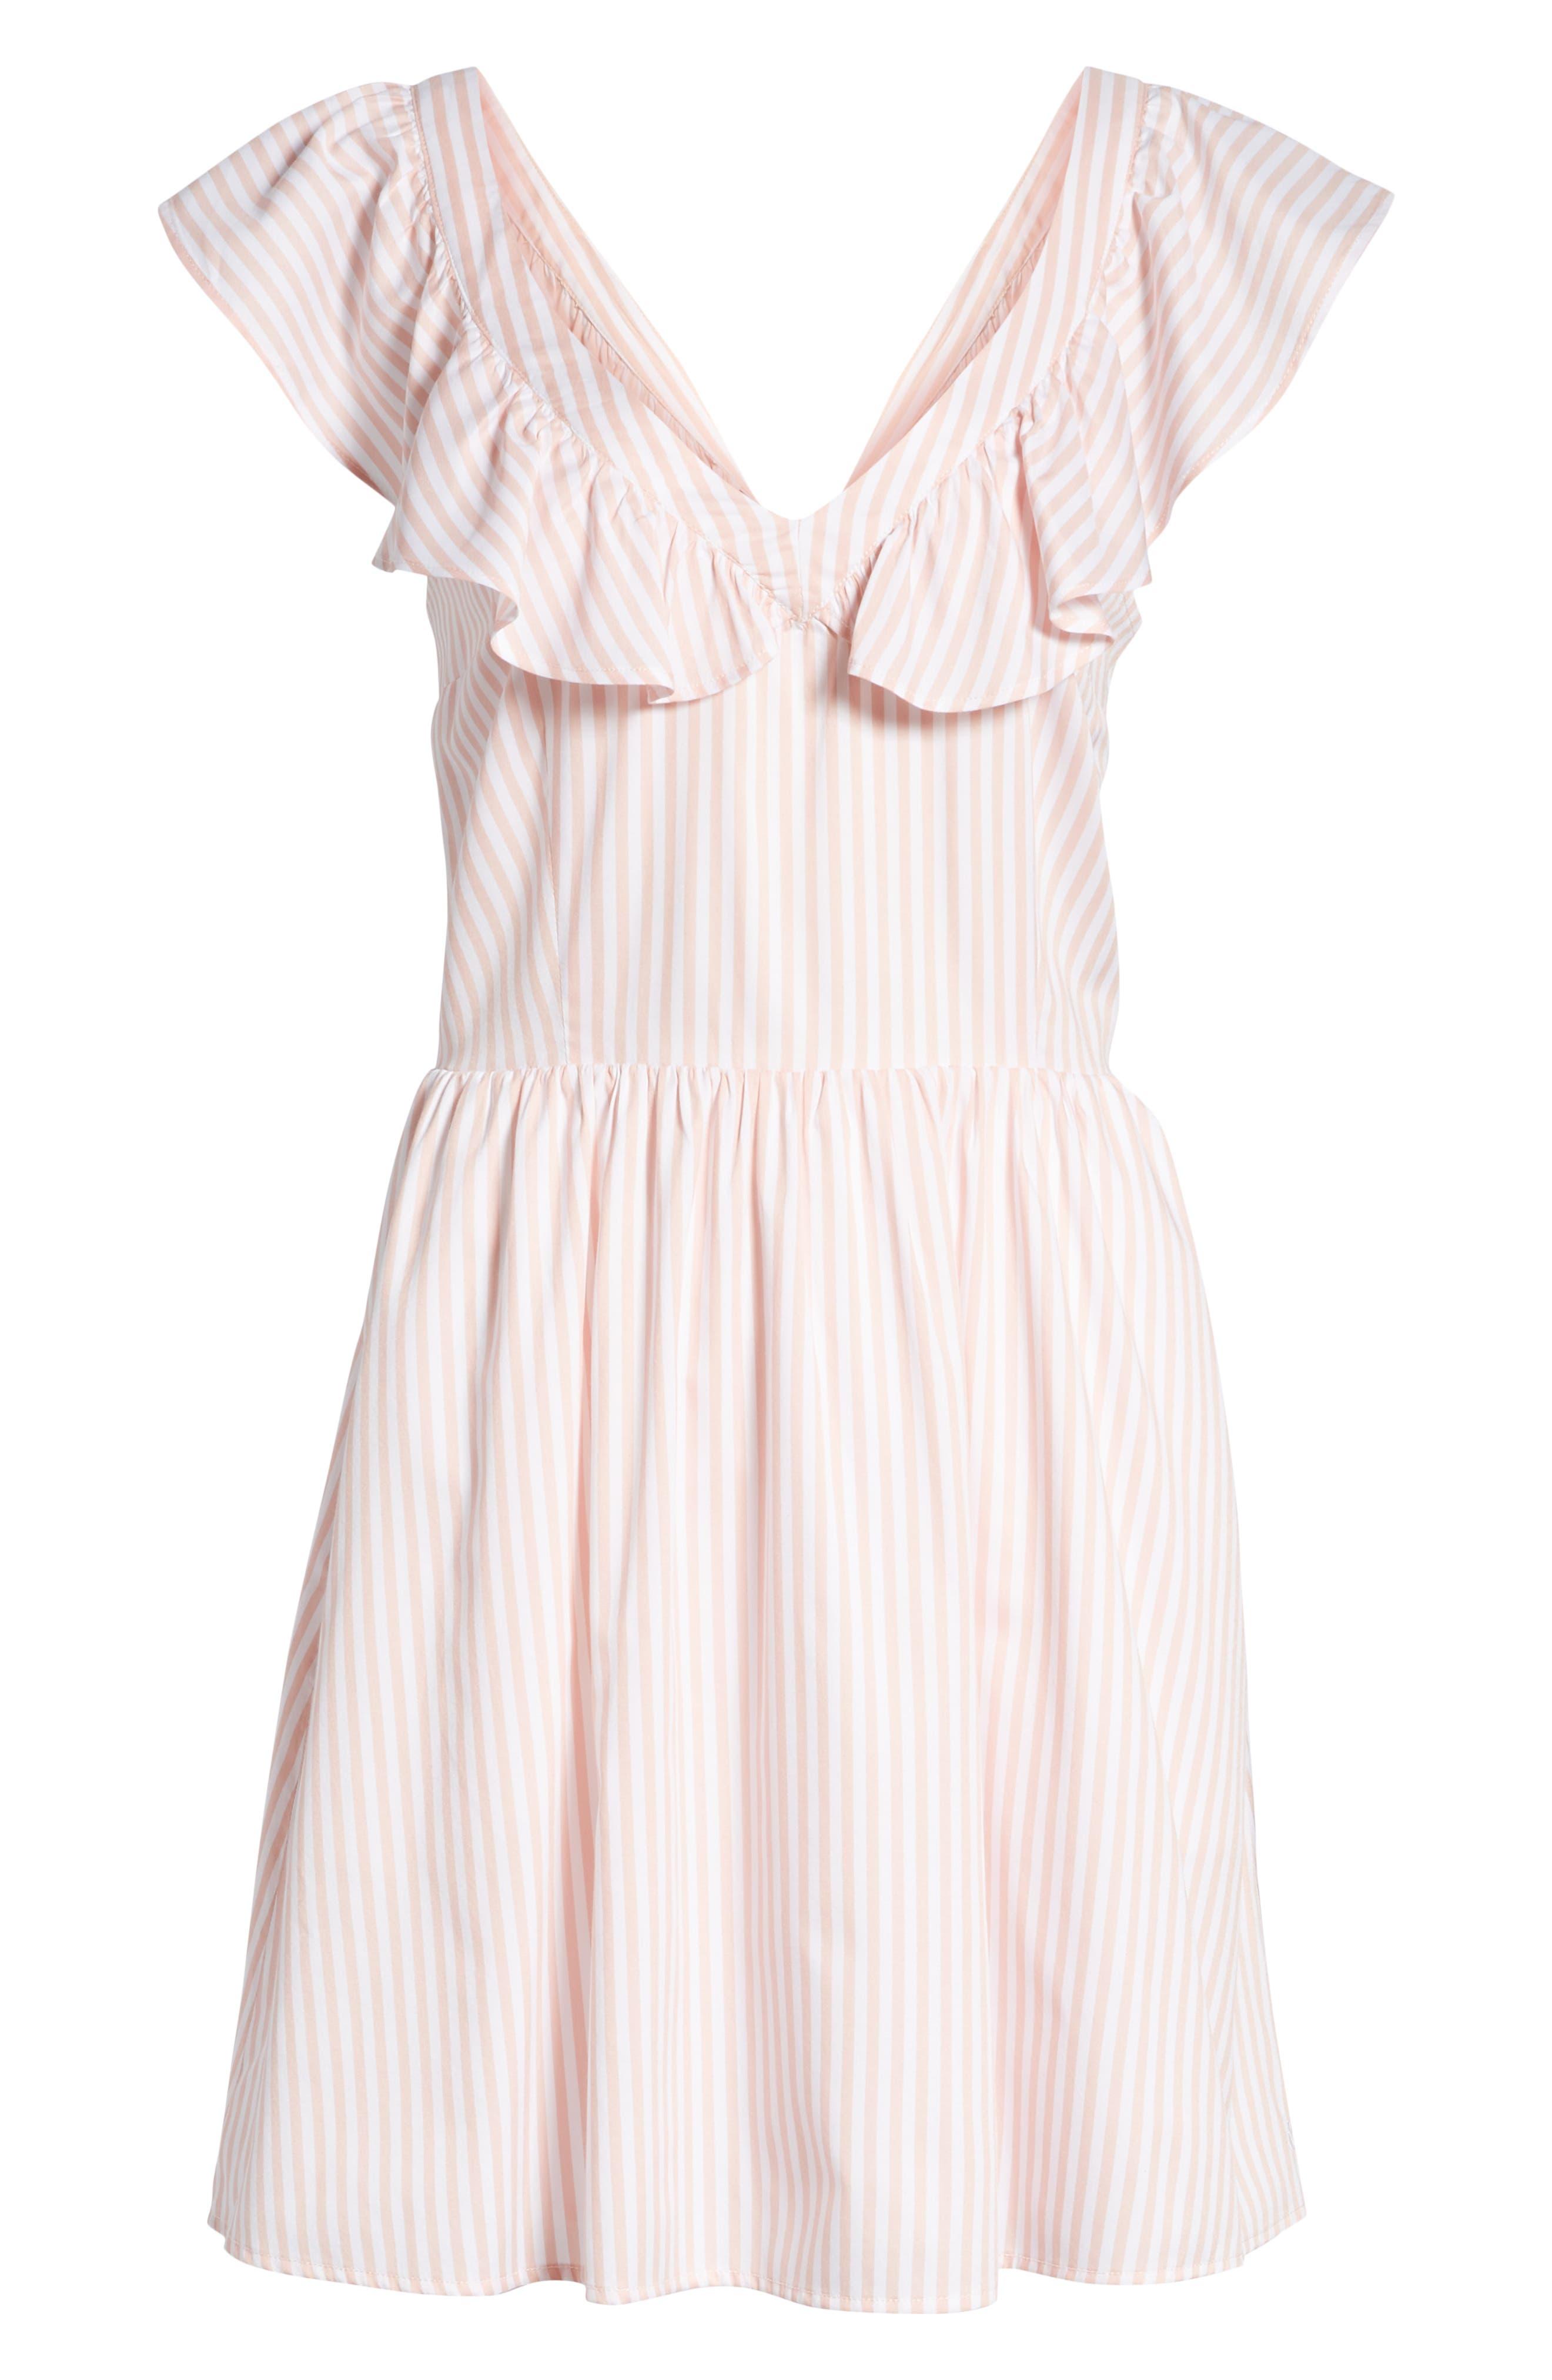 Ruffle Dress,                             Alternate thumbnail 7, color,                             660